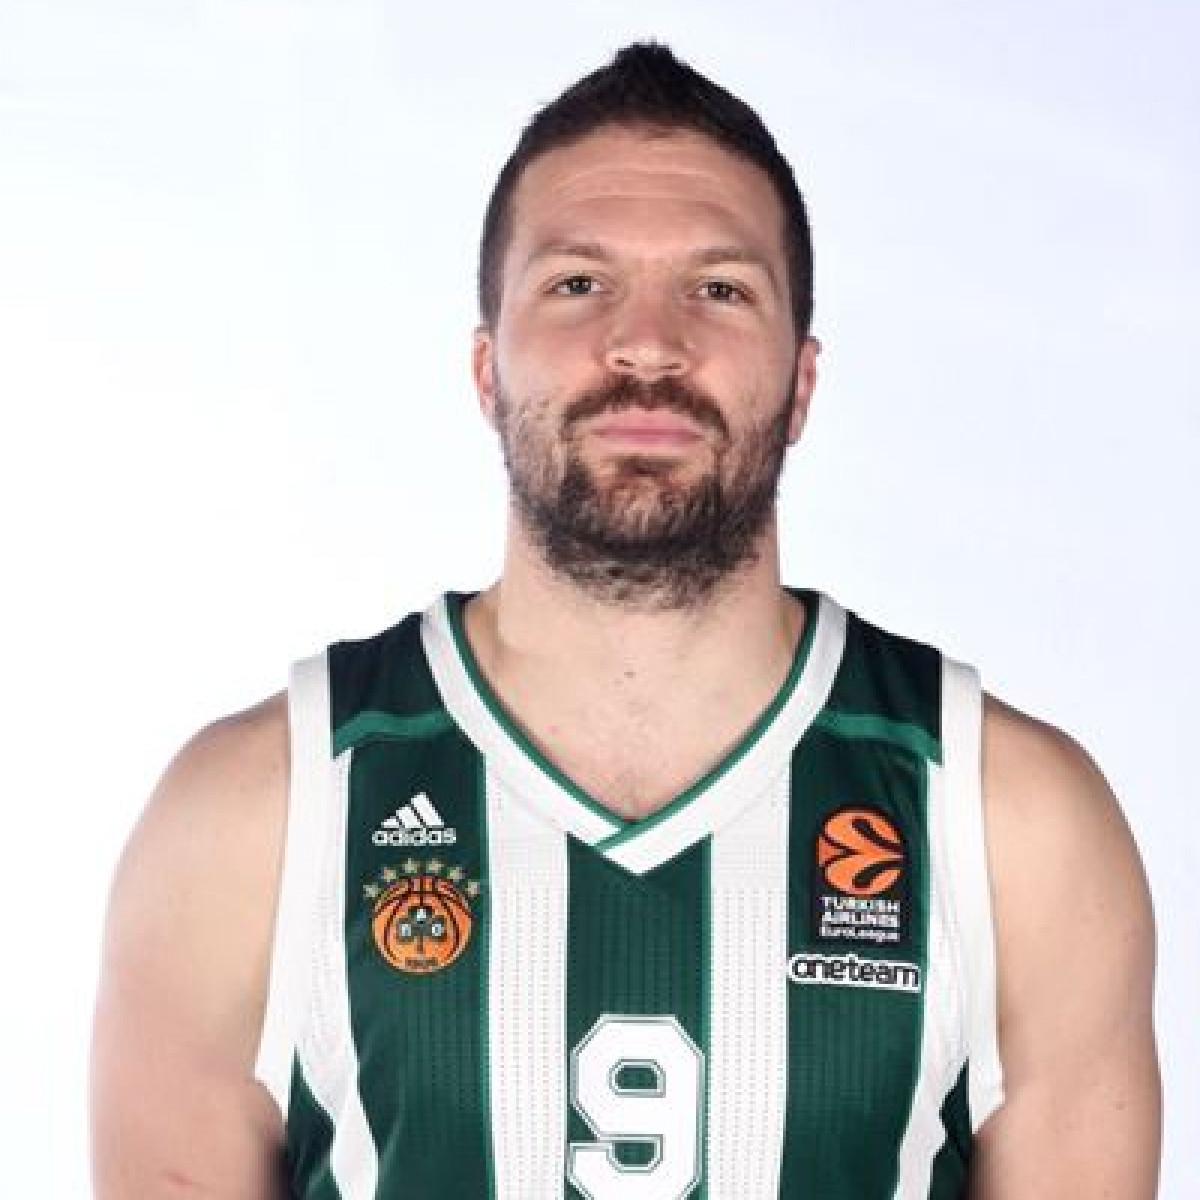 Photo of Vaggelis Sakellariou, 2018-2019 season